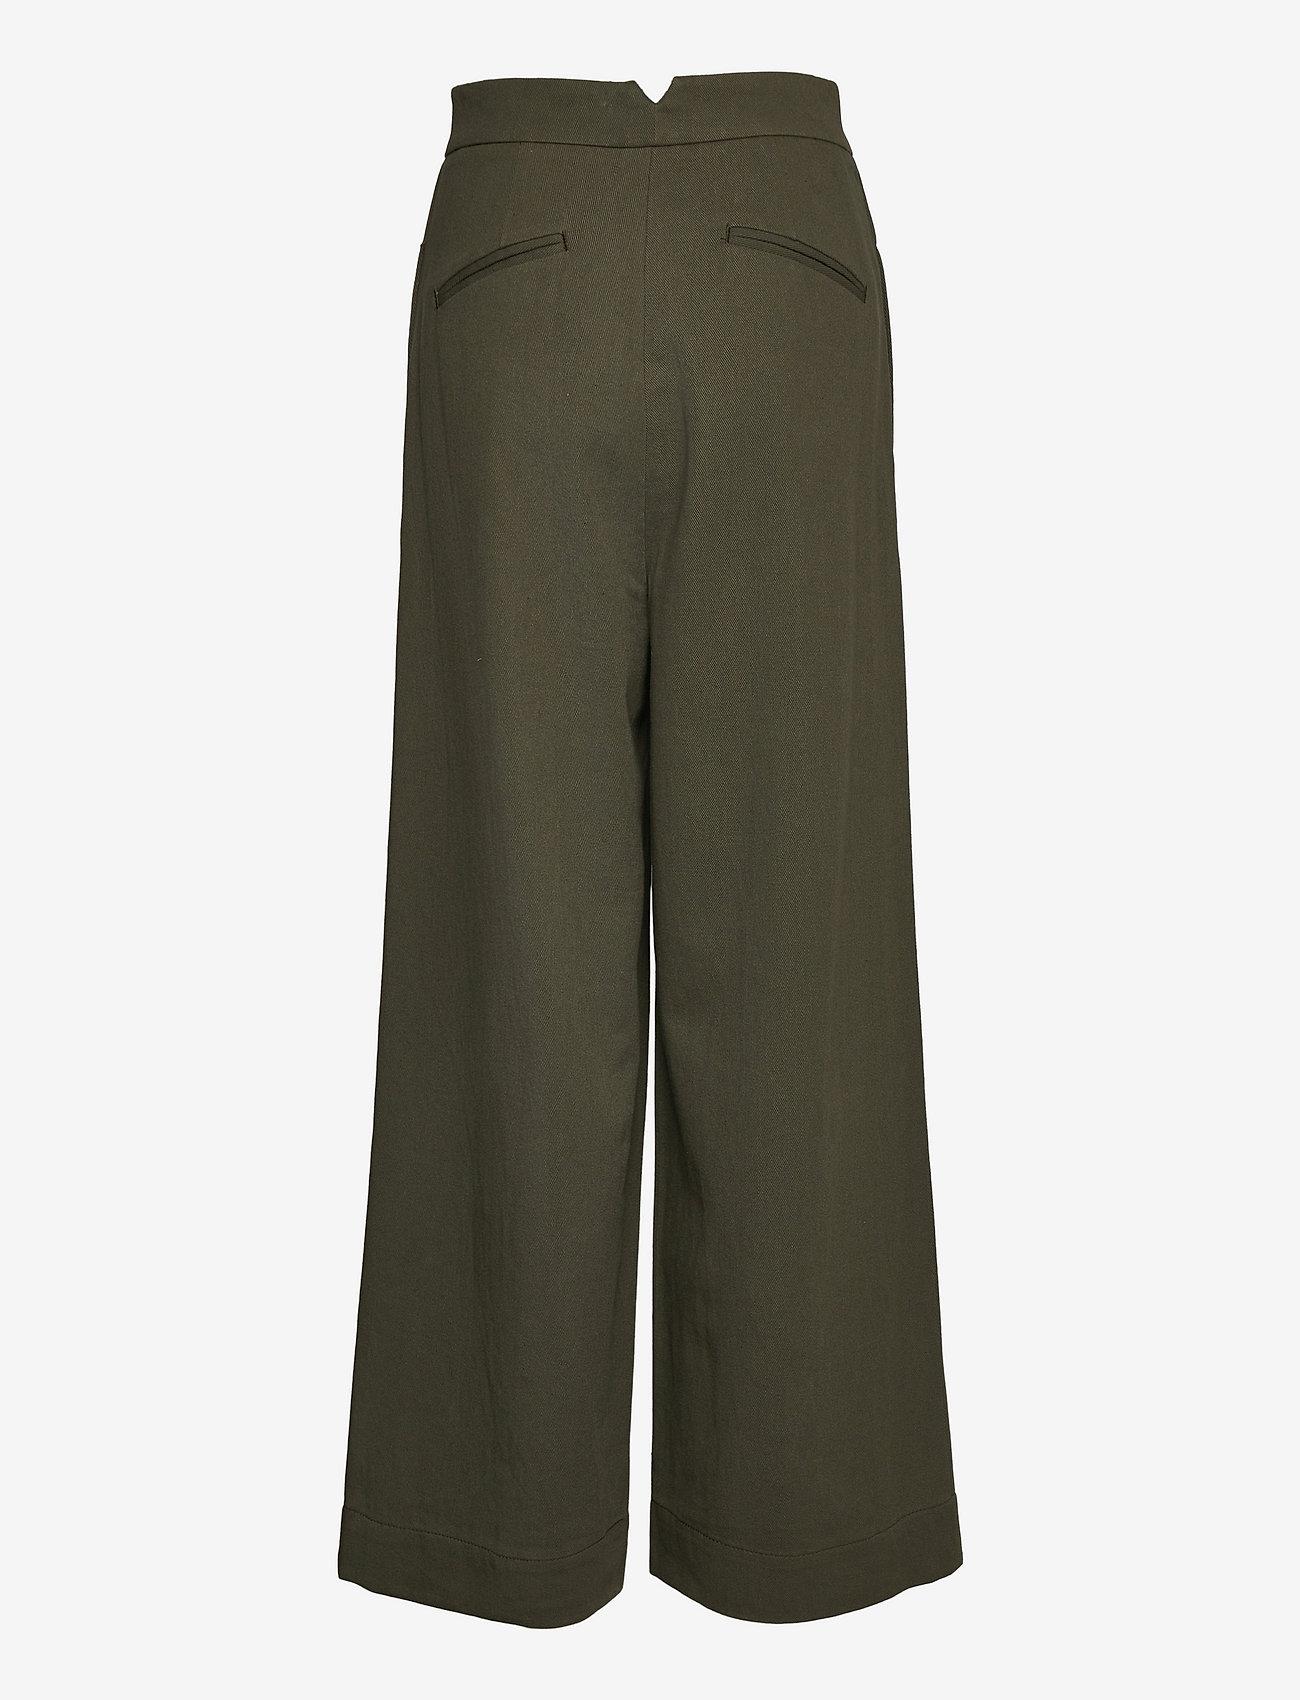 Cathrine Hammel - Twill wide leg pants - bukser med brede ben - army green - 1